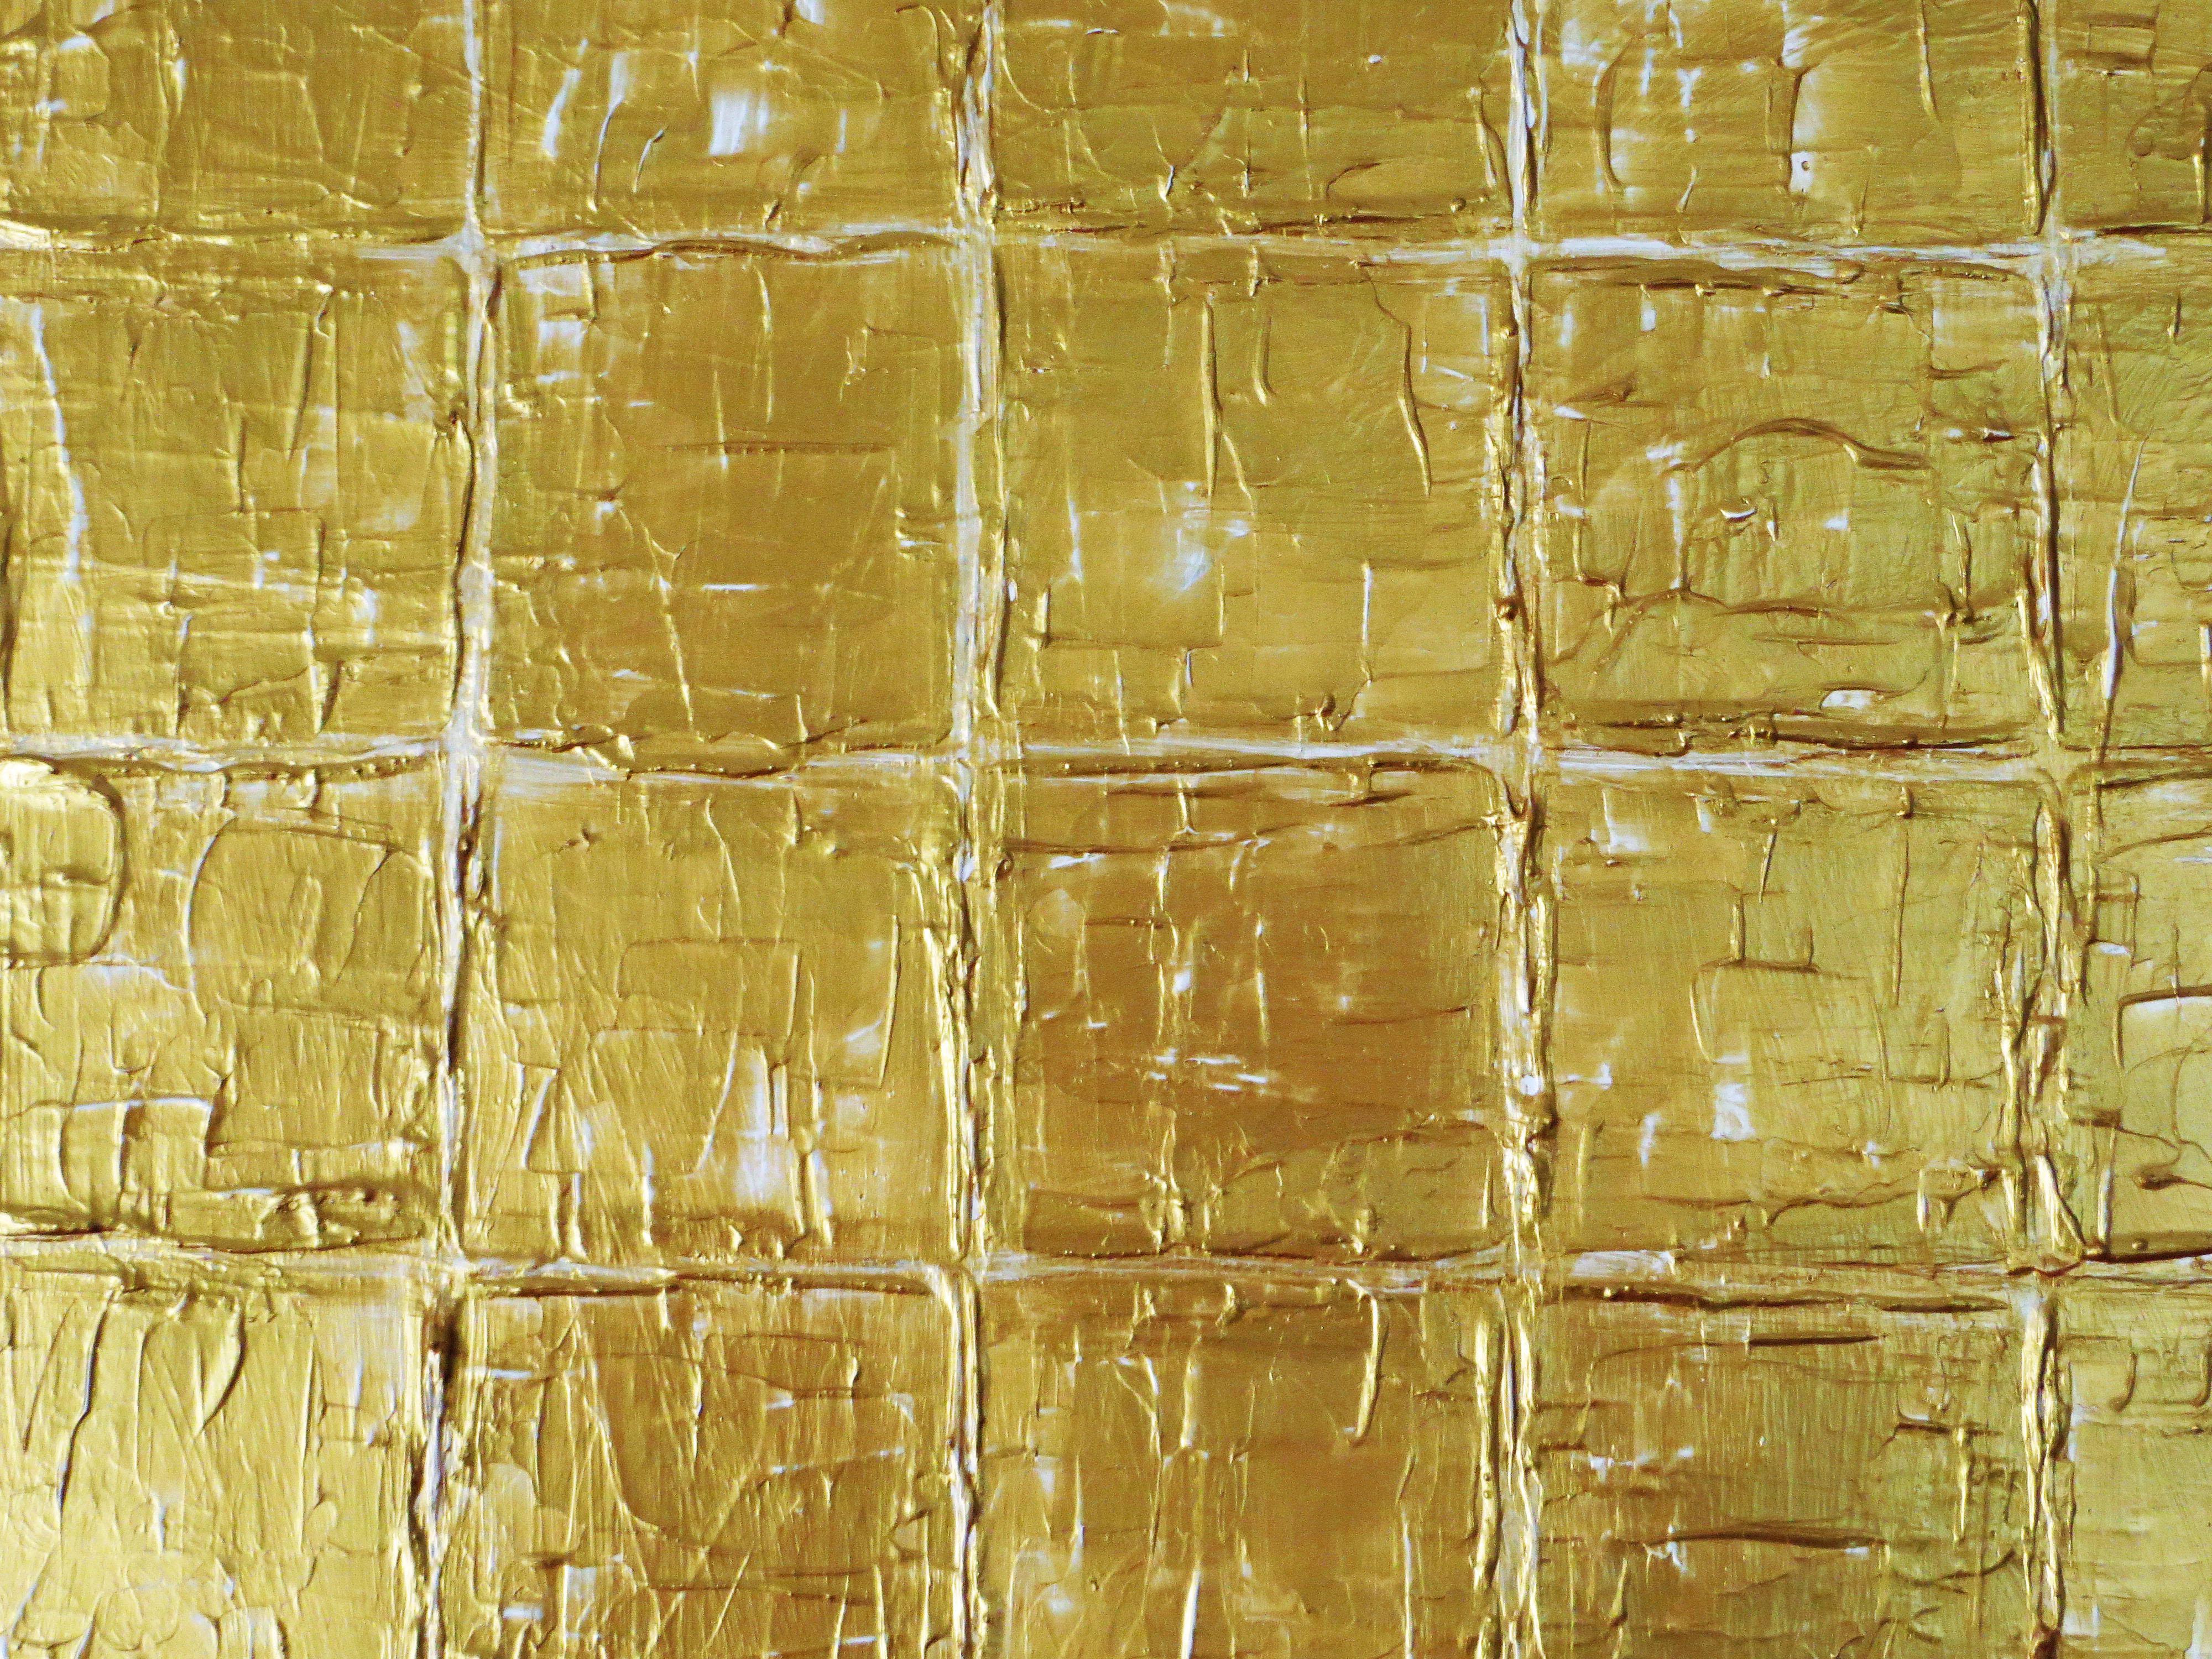 V217 GOLD GOLD 2 DETAIL